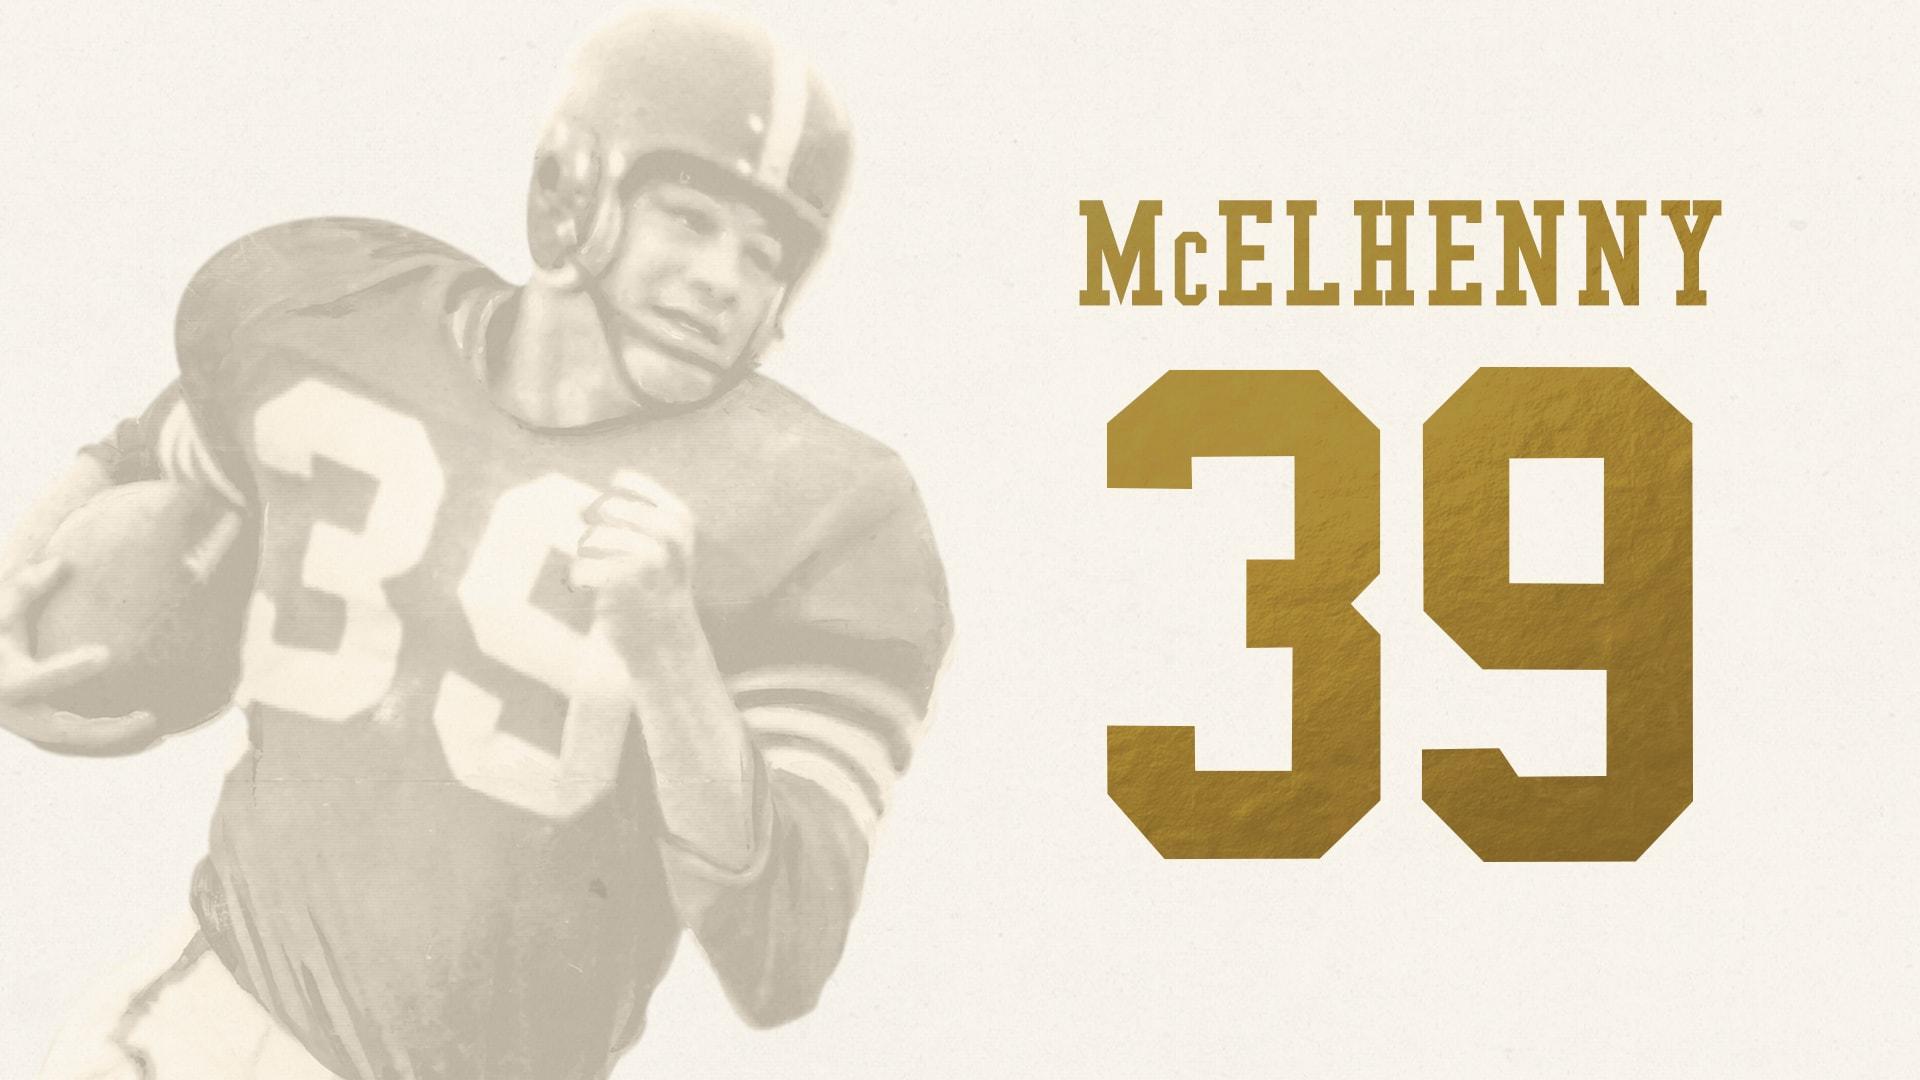 Hugh McElhenny, RB (1952-1960)